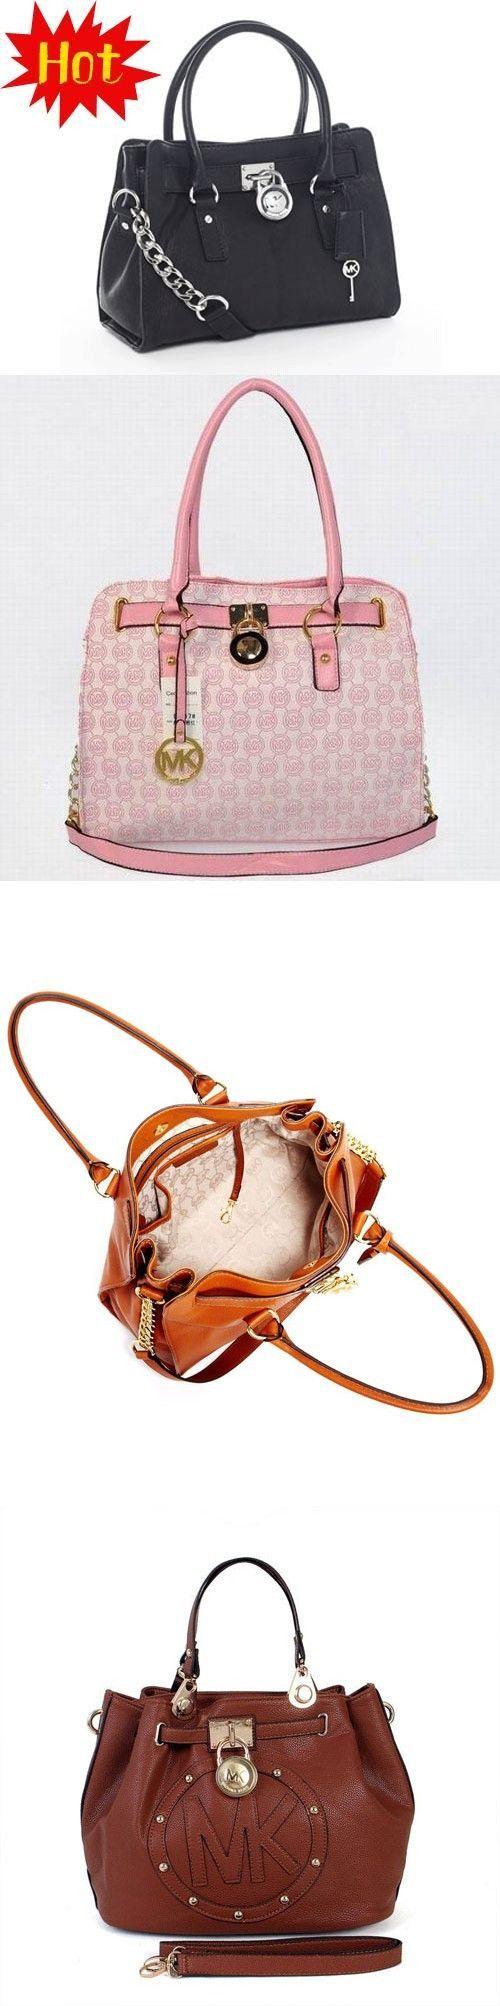 Cheap Michael Kors Handbags,Michael Kors Diaper Bag,Michael Kors Runway Watch $59.99